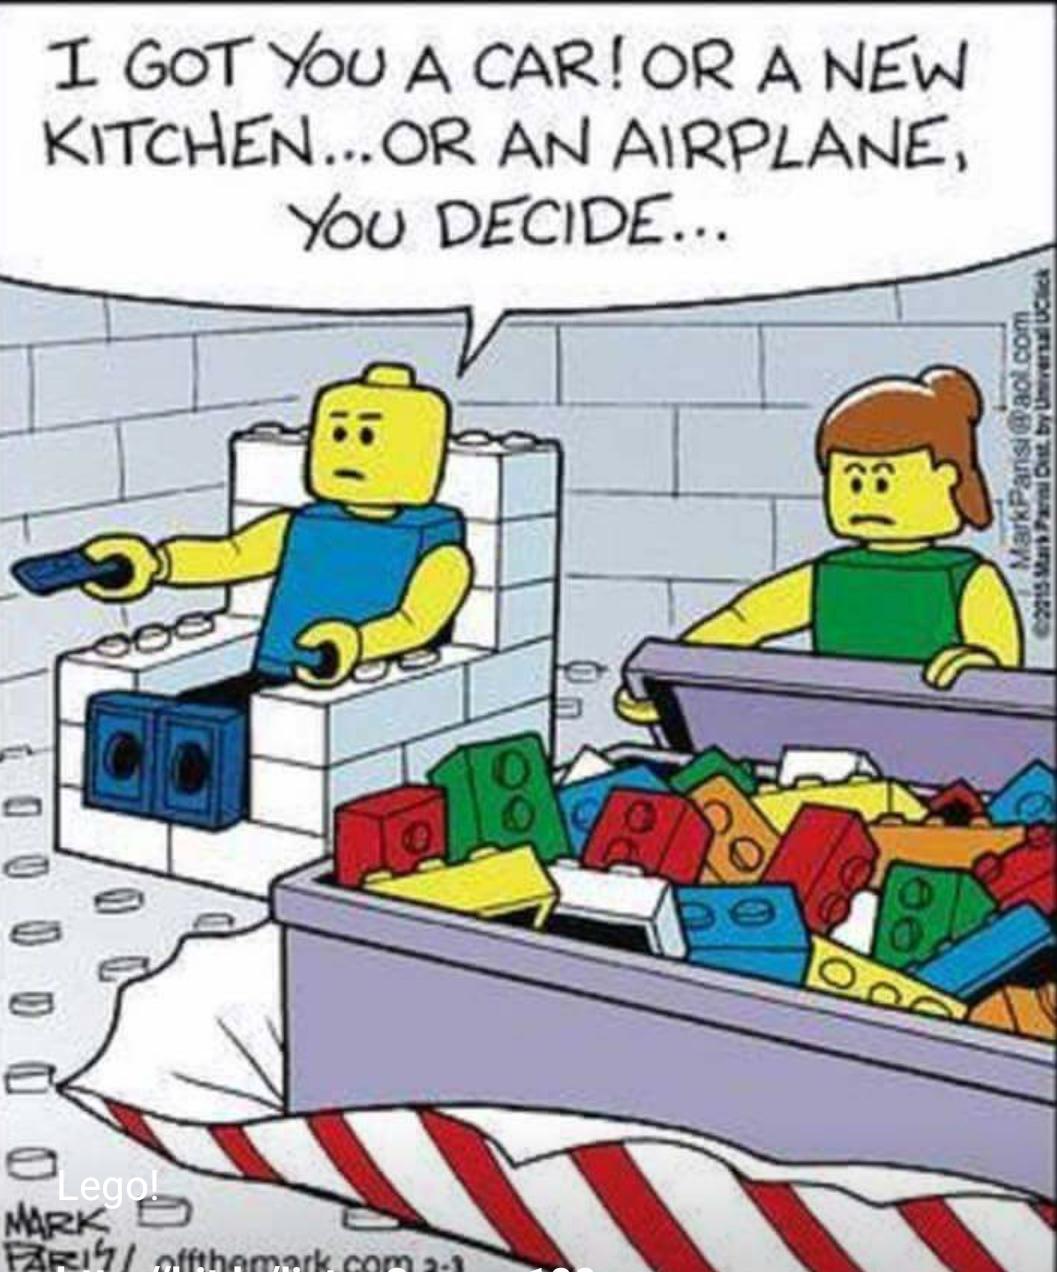 Lego relationship